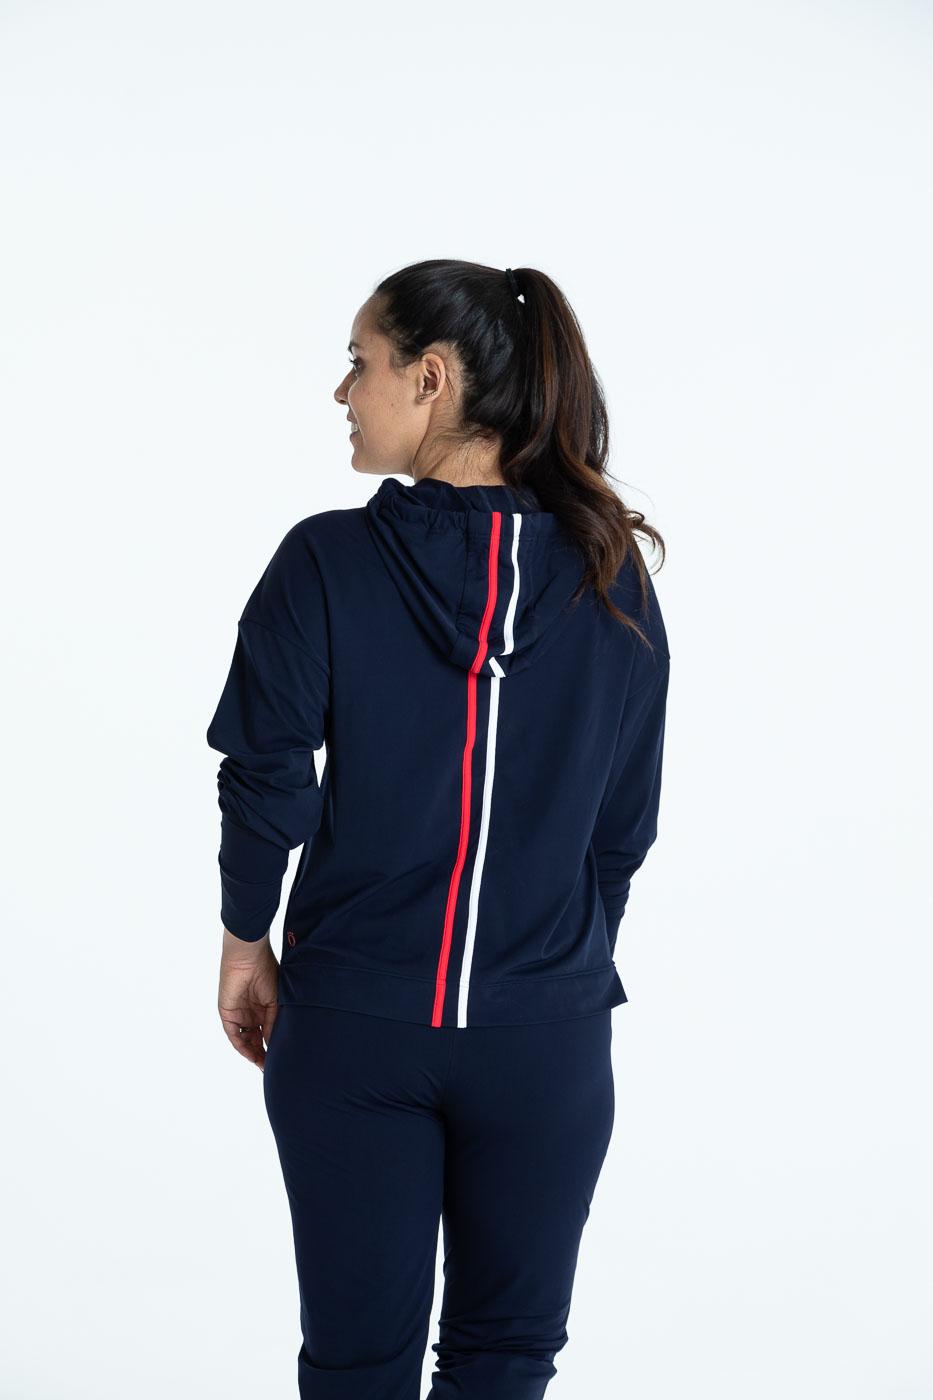 Back view of woman wearing a navy blue Apres 18 Sporty Stripe Longsleeve Hoodie